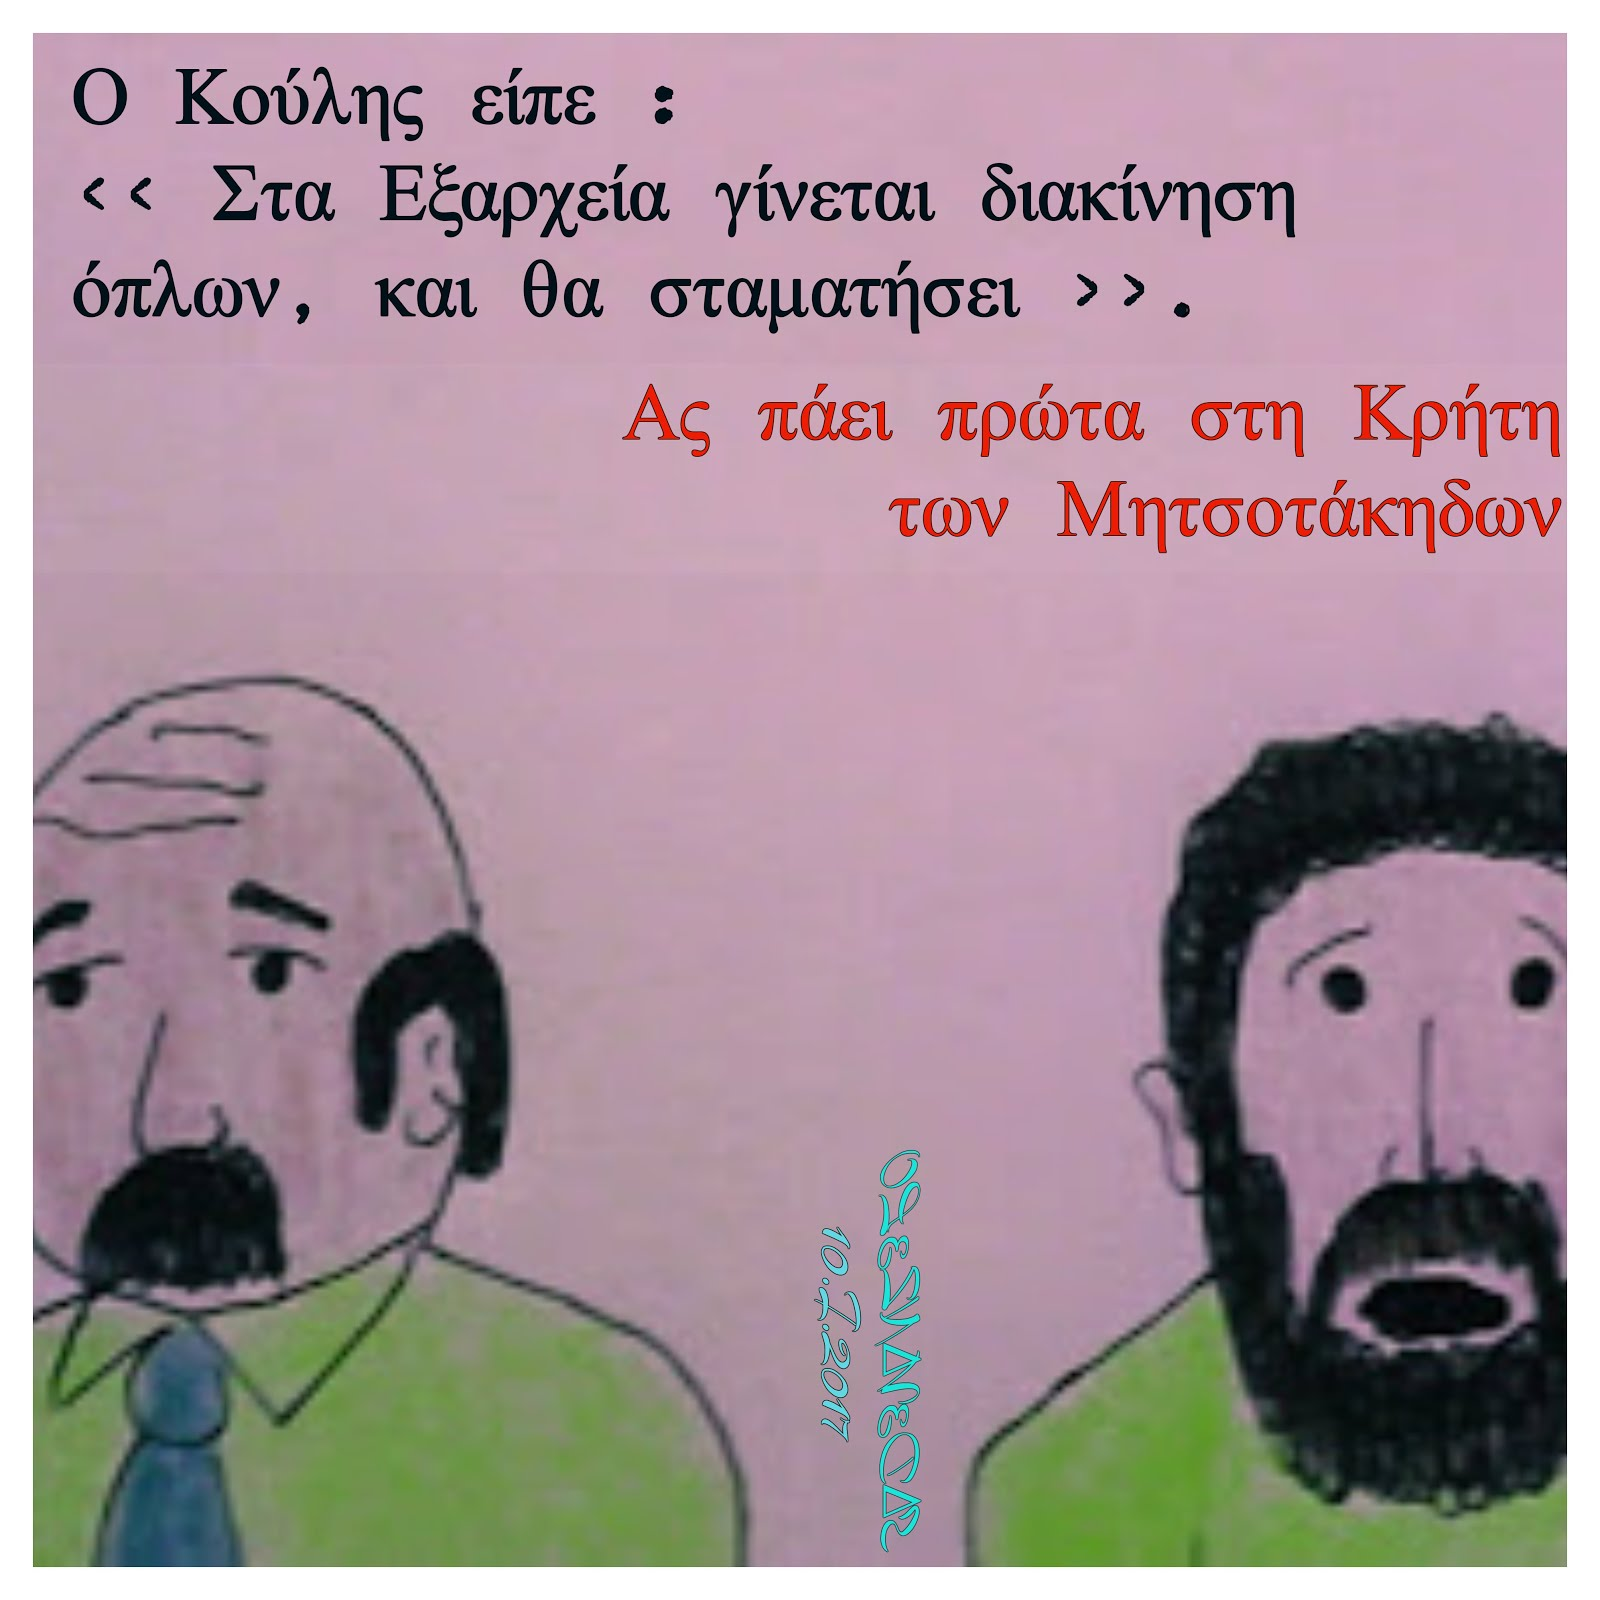 STOP τα όπλα σε Κρήτη, Εξάρχεια !